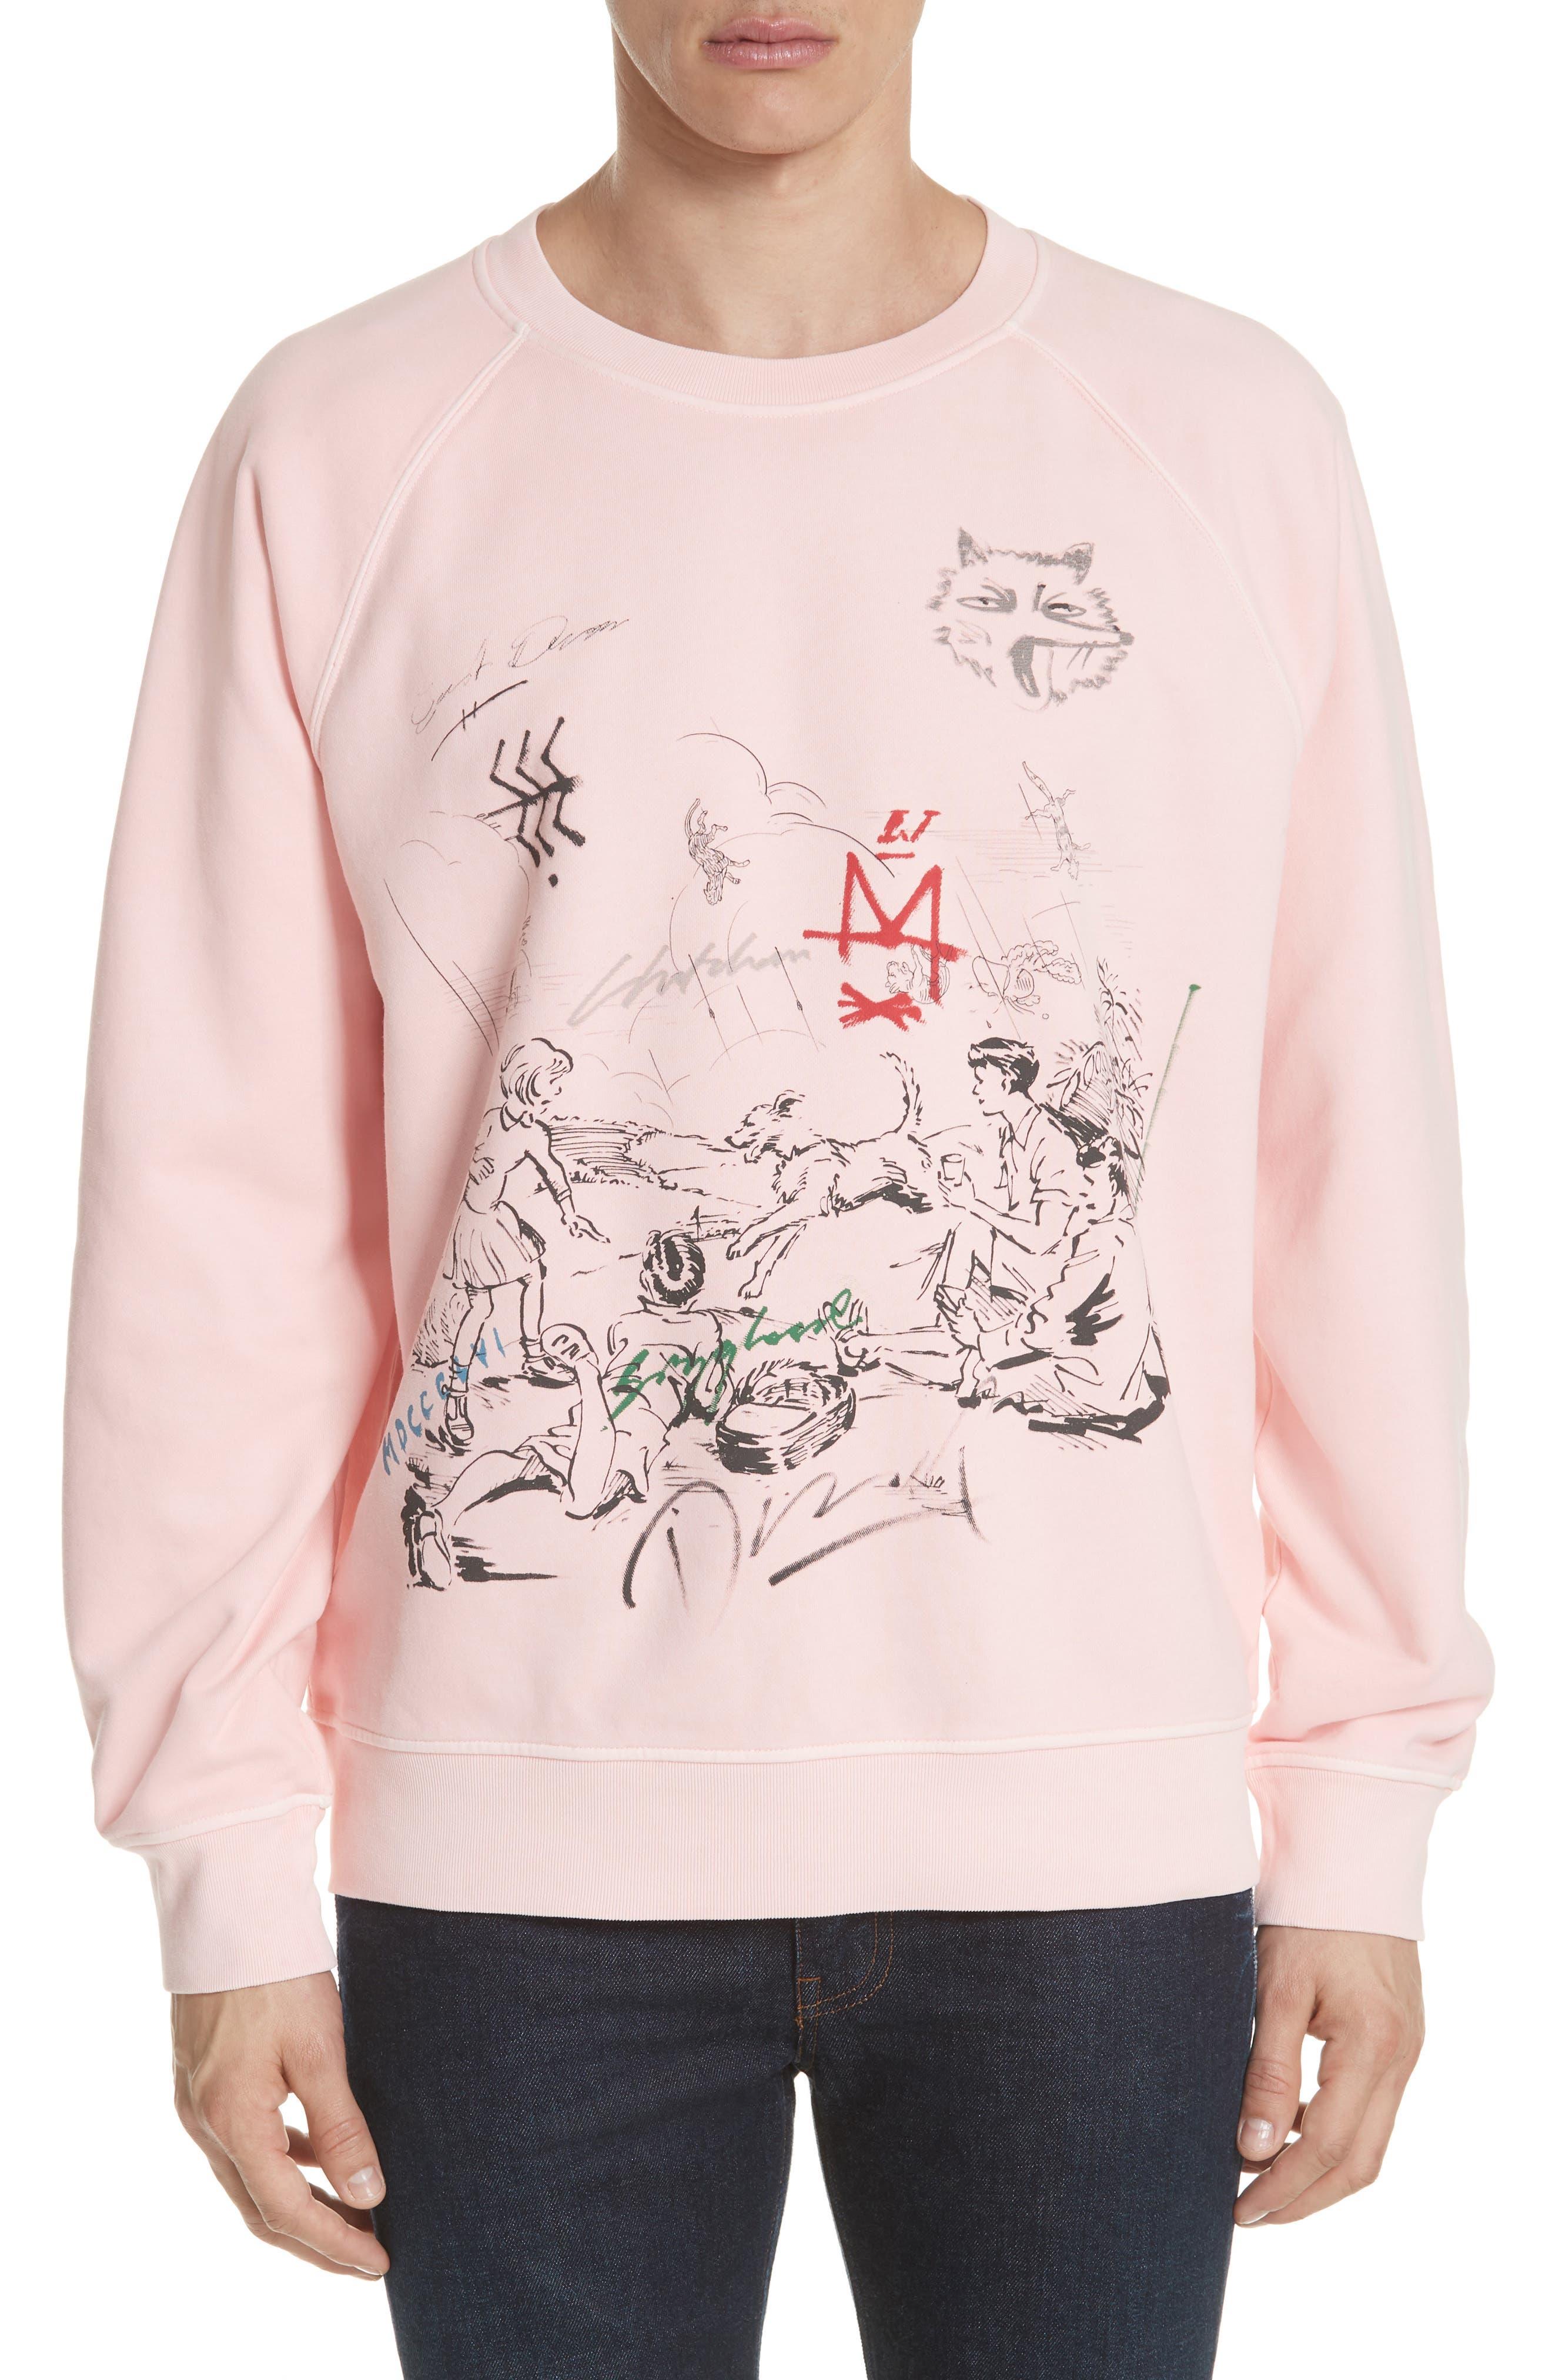 Burberry Fellworth Graphic Crewneck Sweatshirt